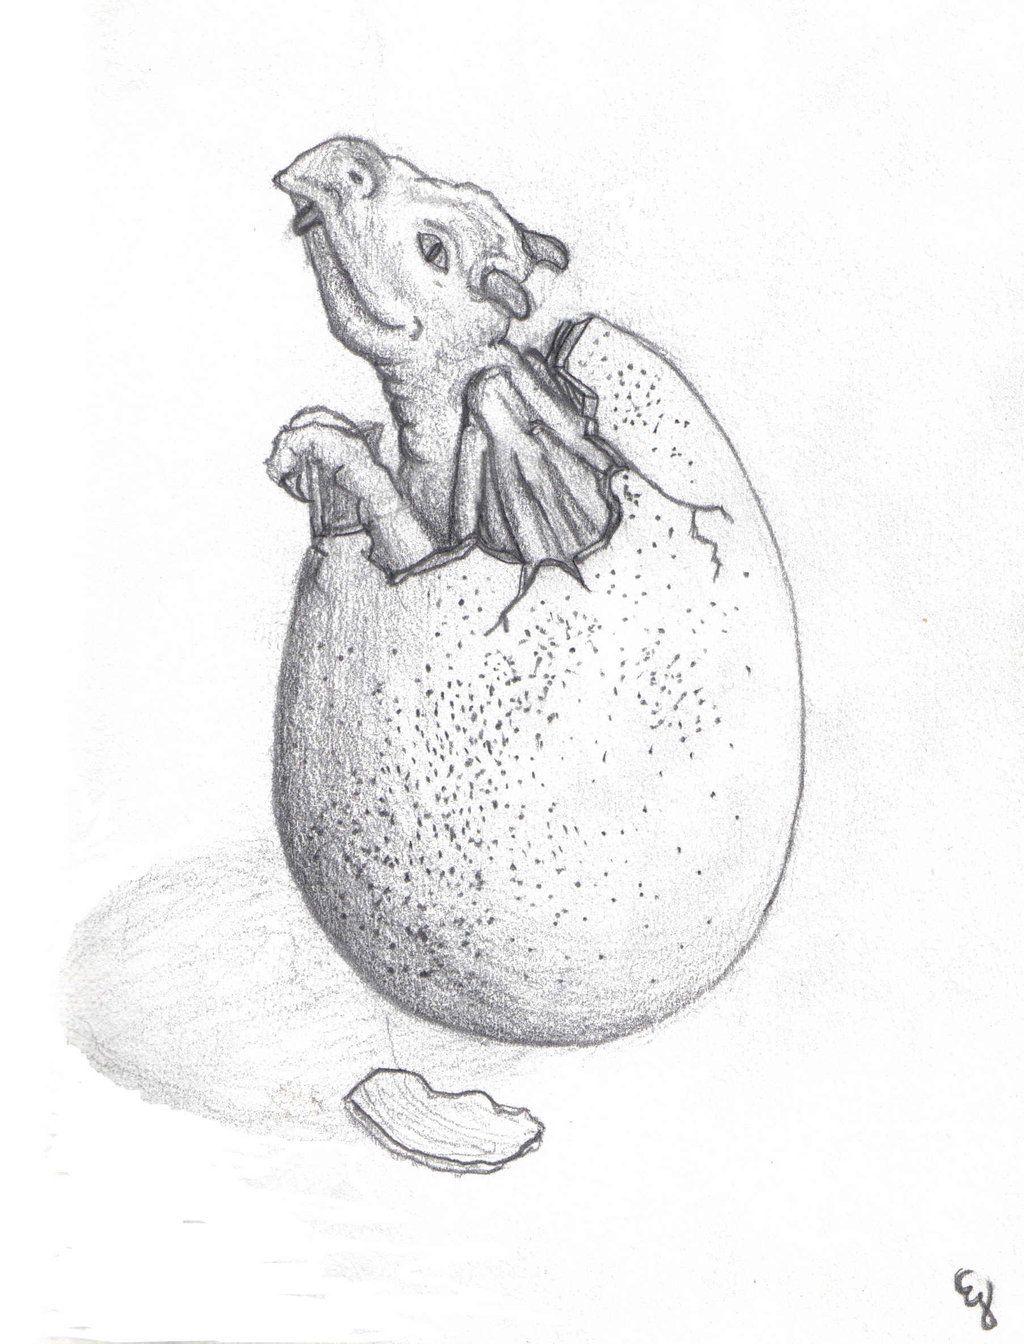 When Do The Dragon Eggs Hatch In Got